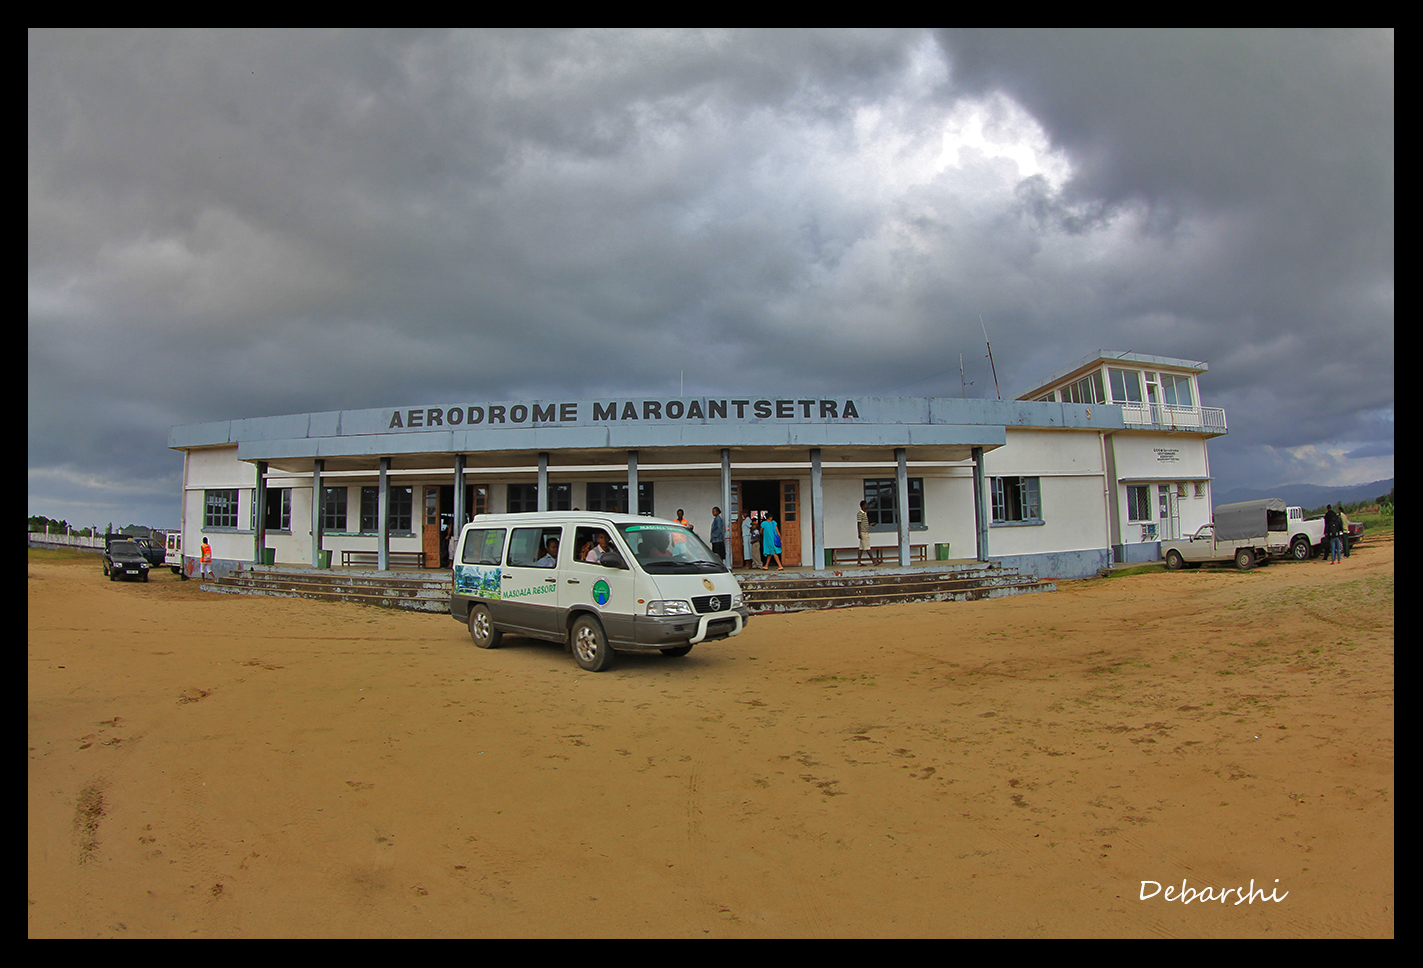 Maroantsetra Airport